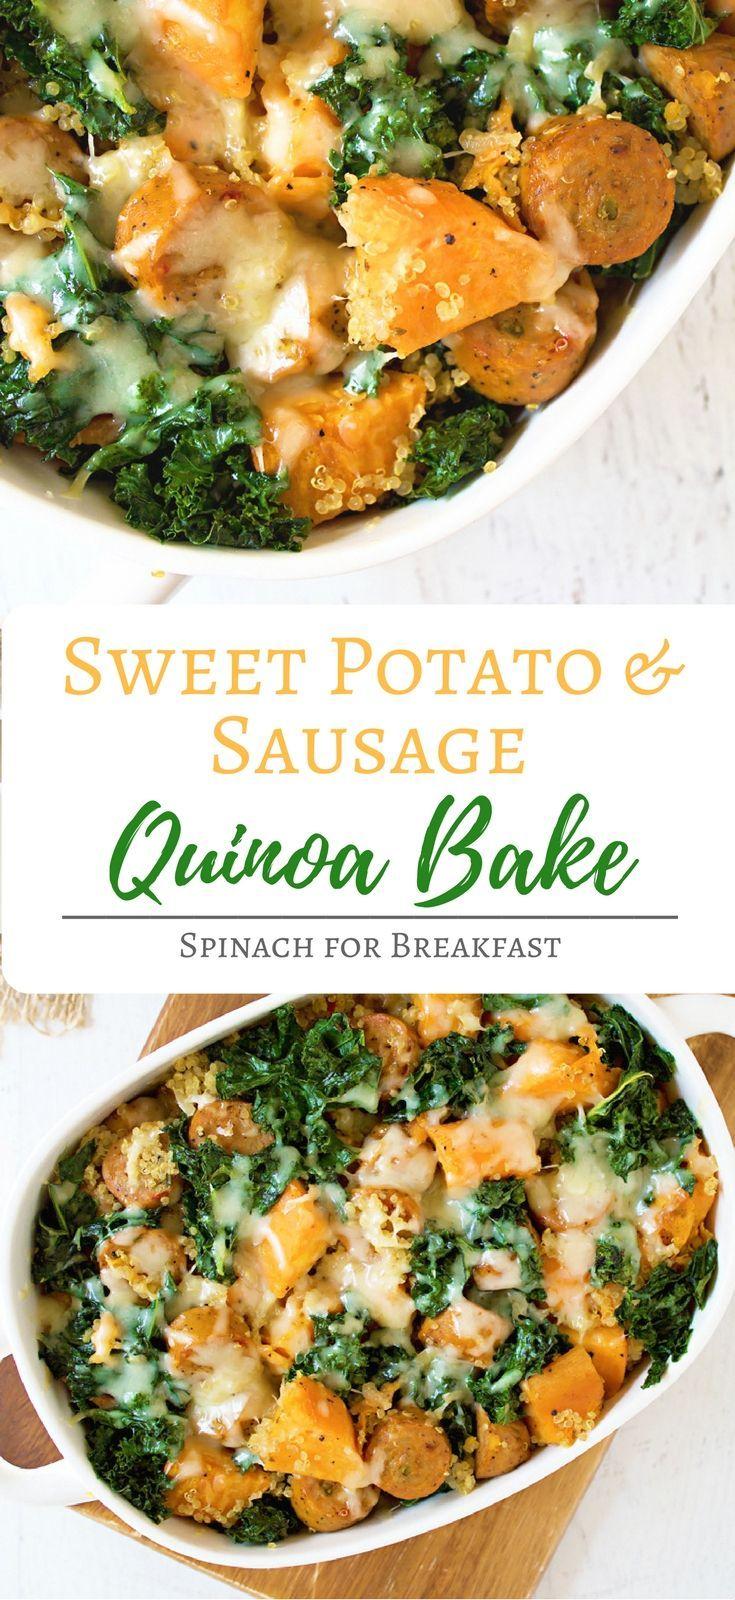 Sweet Potato and Sausage Quinoa Bake